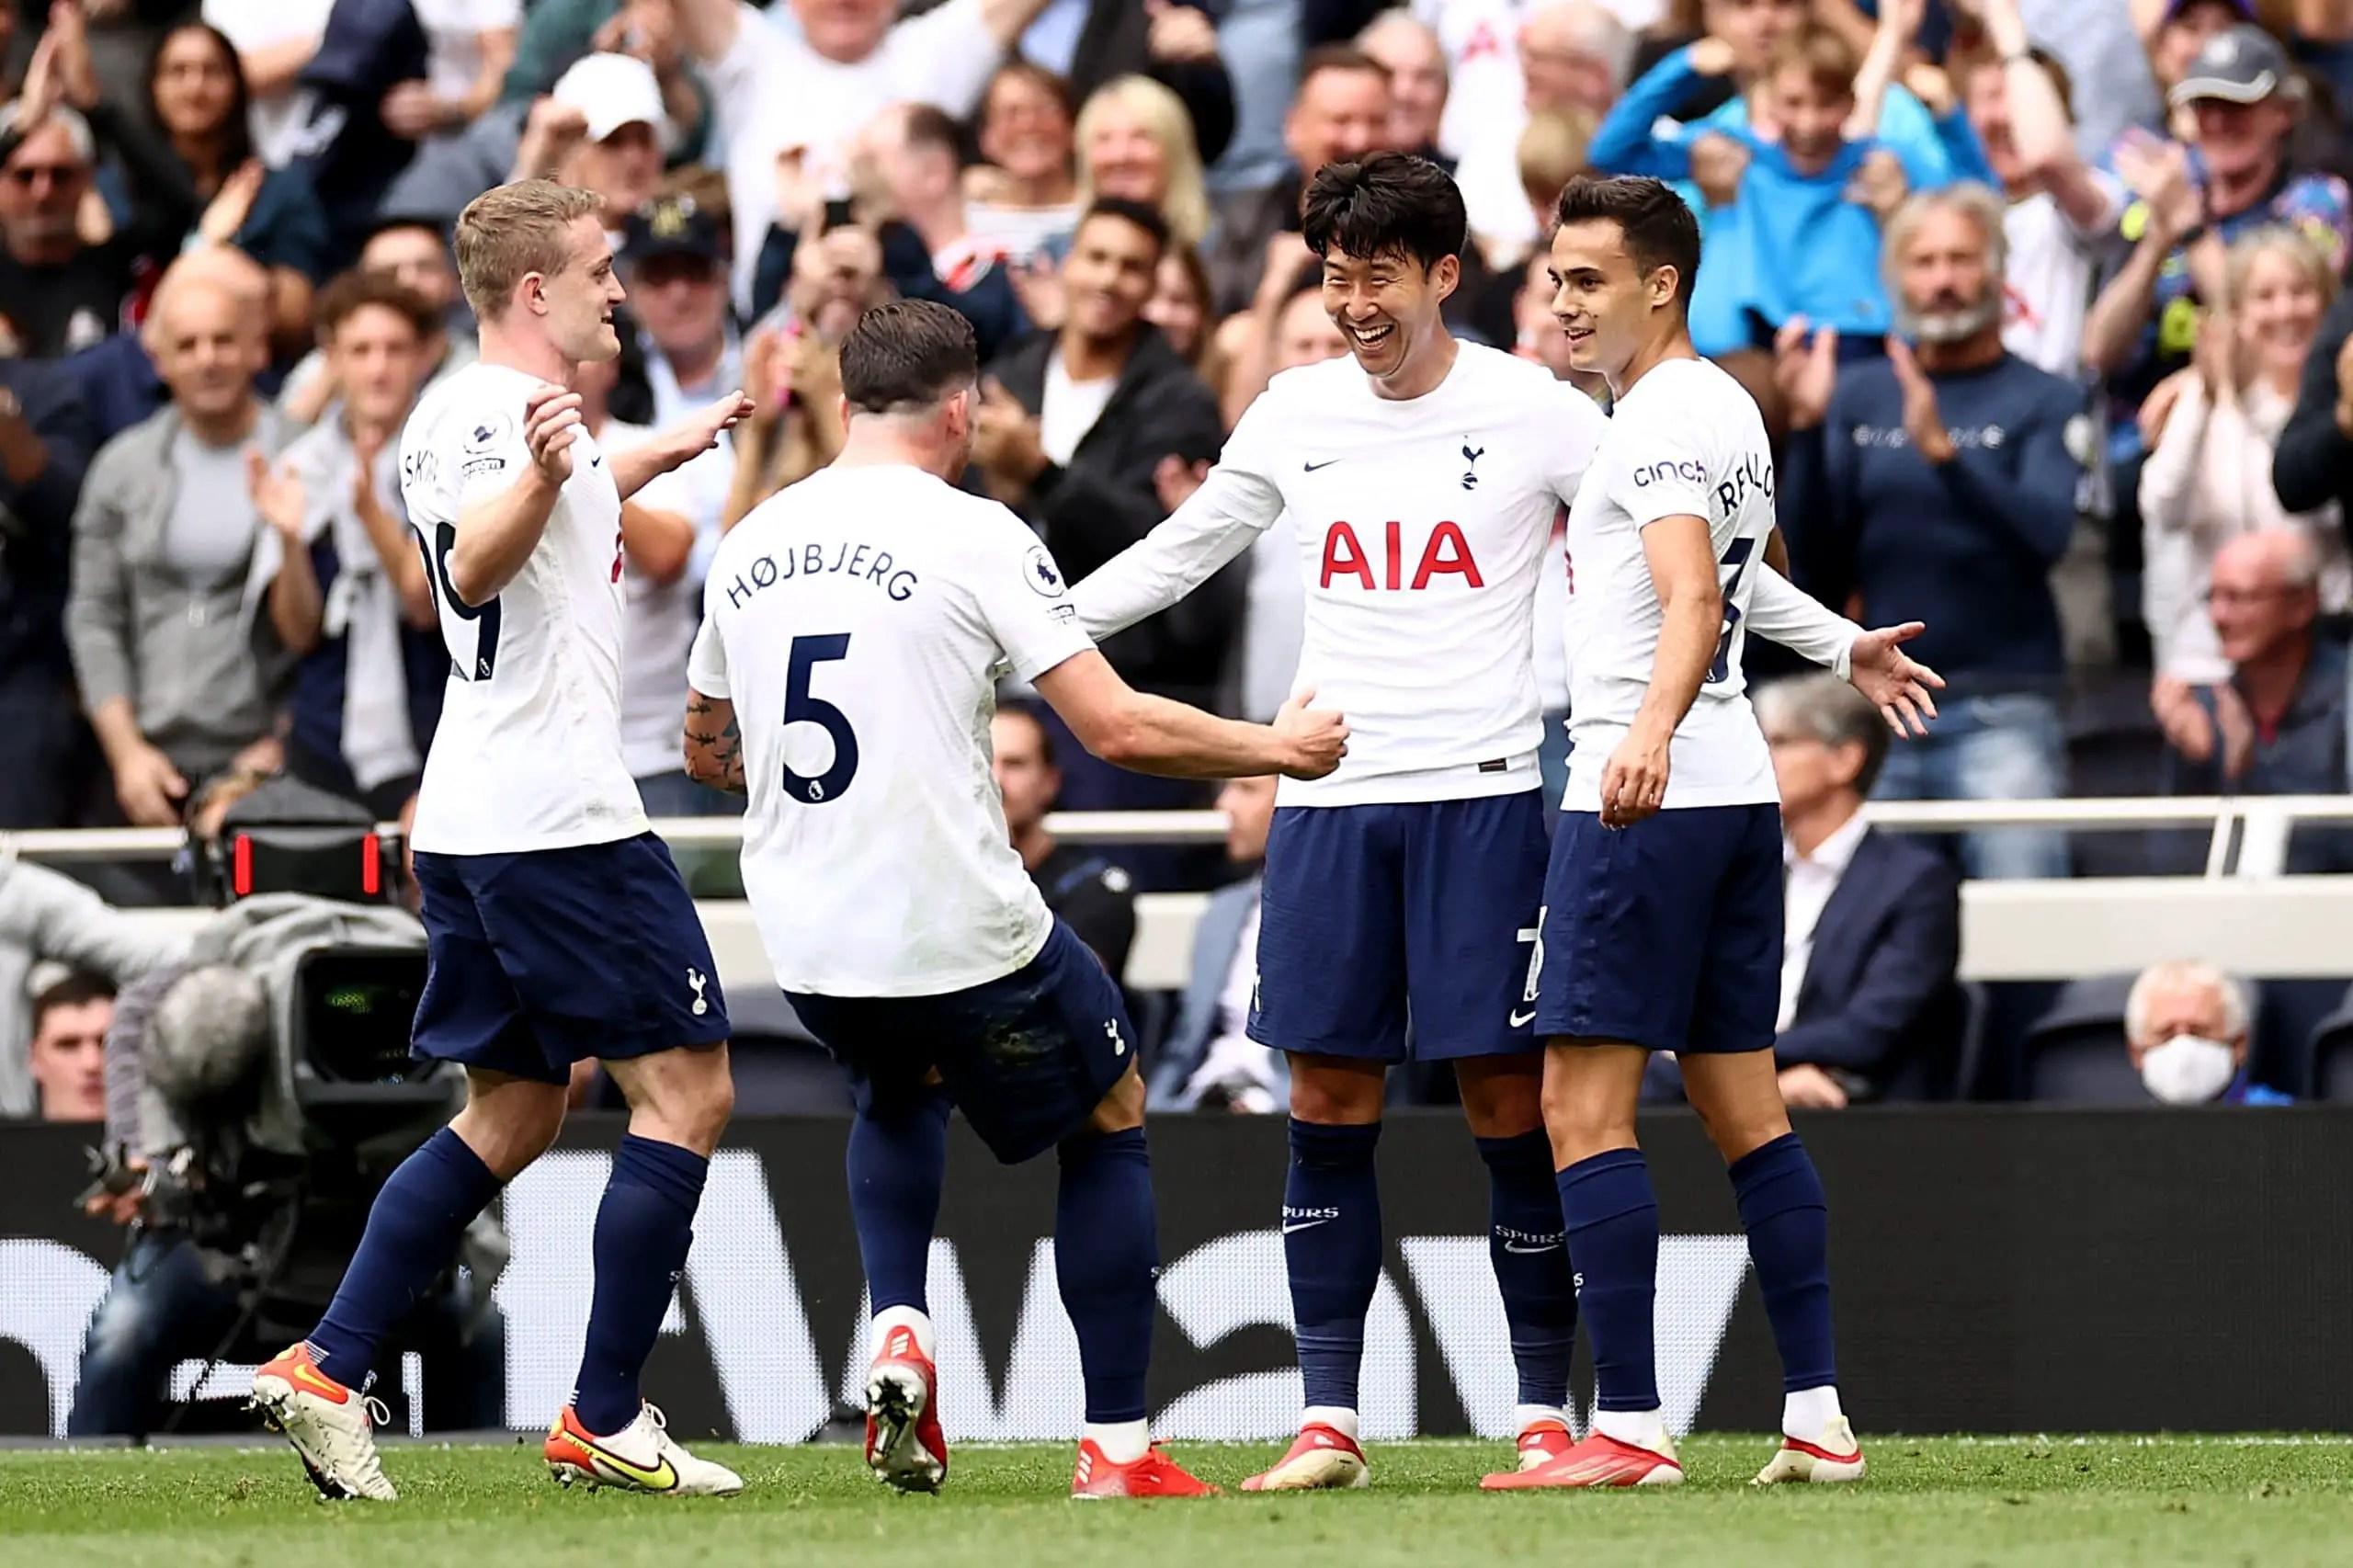 Premier League: Troost-Ekong, Etebo, Dennis In  Action As Watford Fall To Tottenham